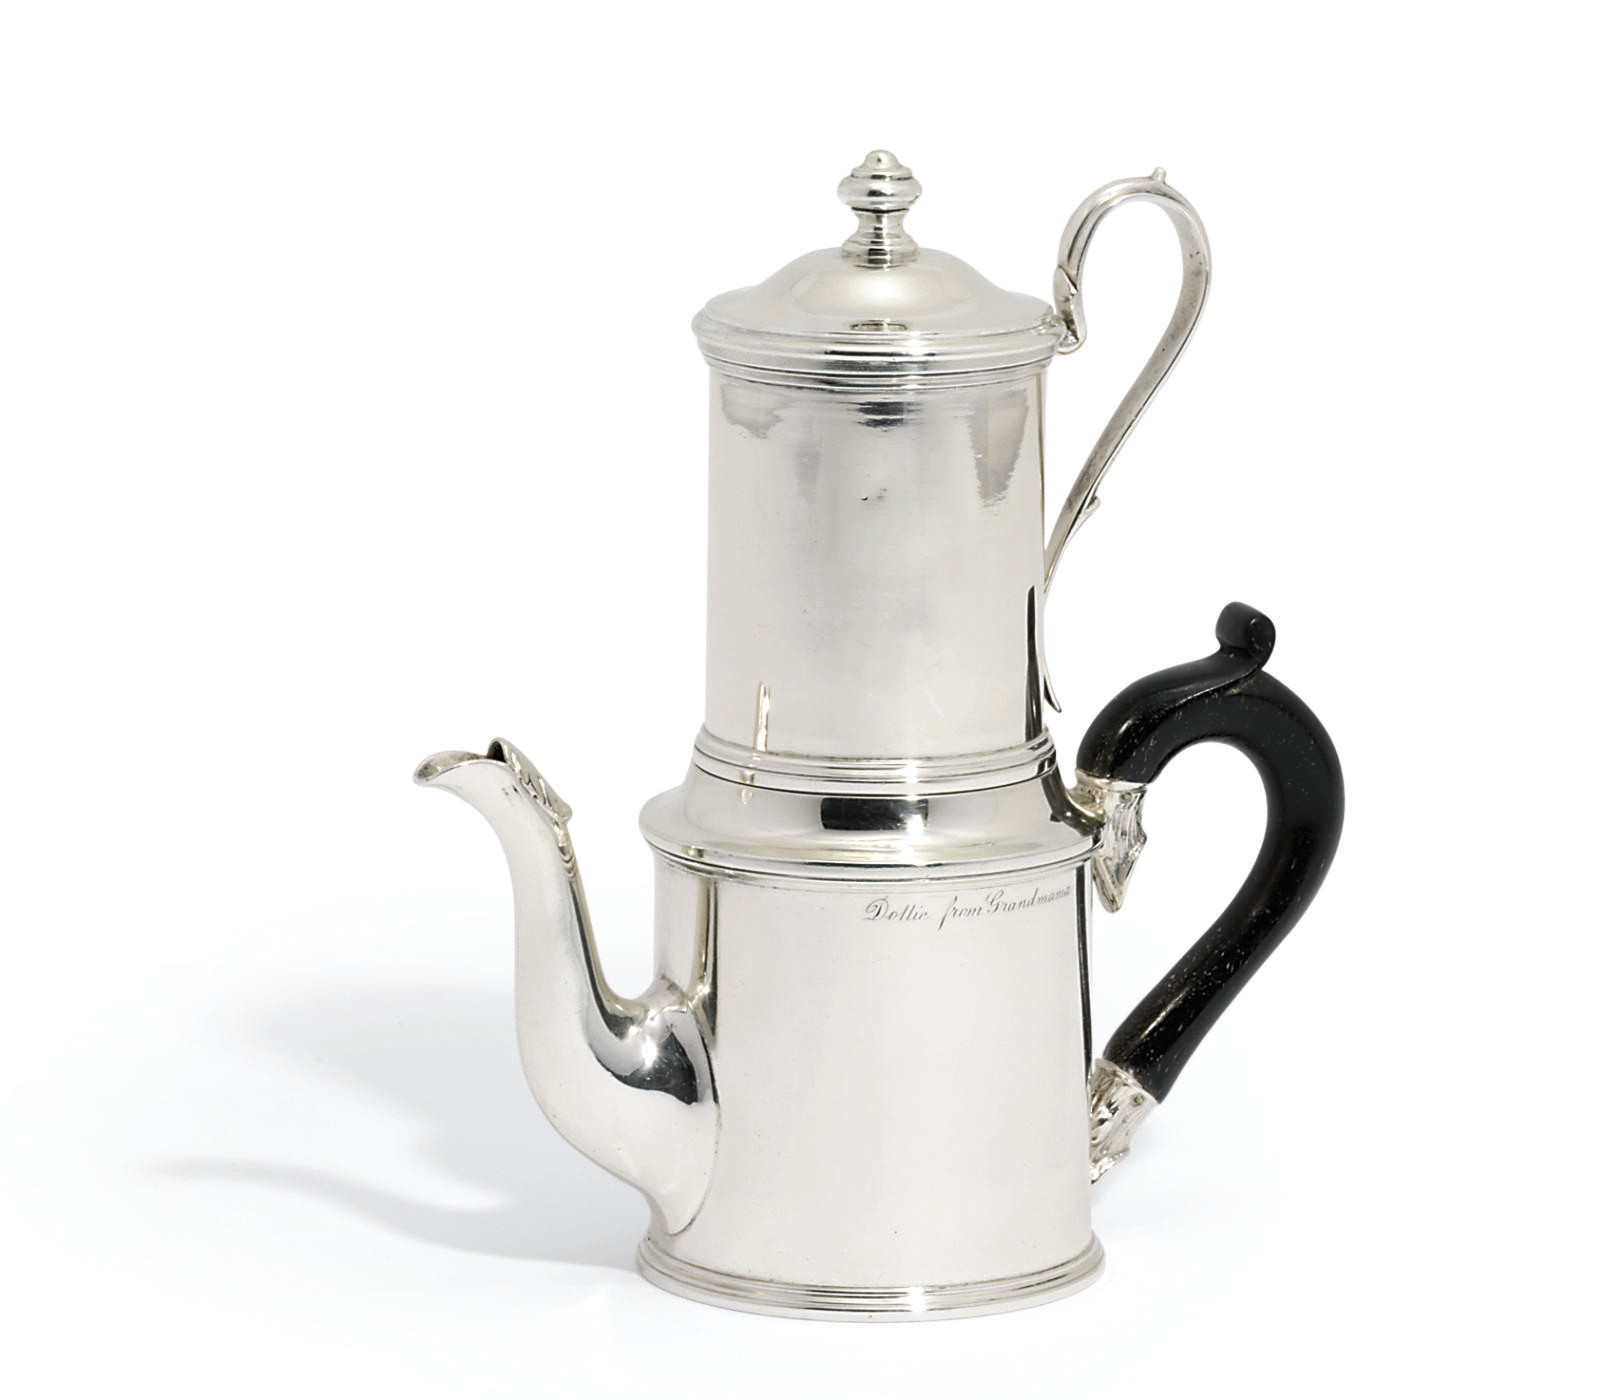 A VICTORIAN SILVER COFFEE-PERCULATOR